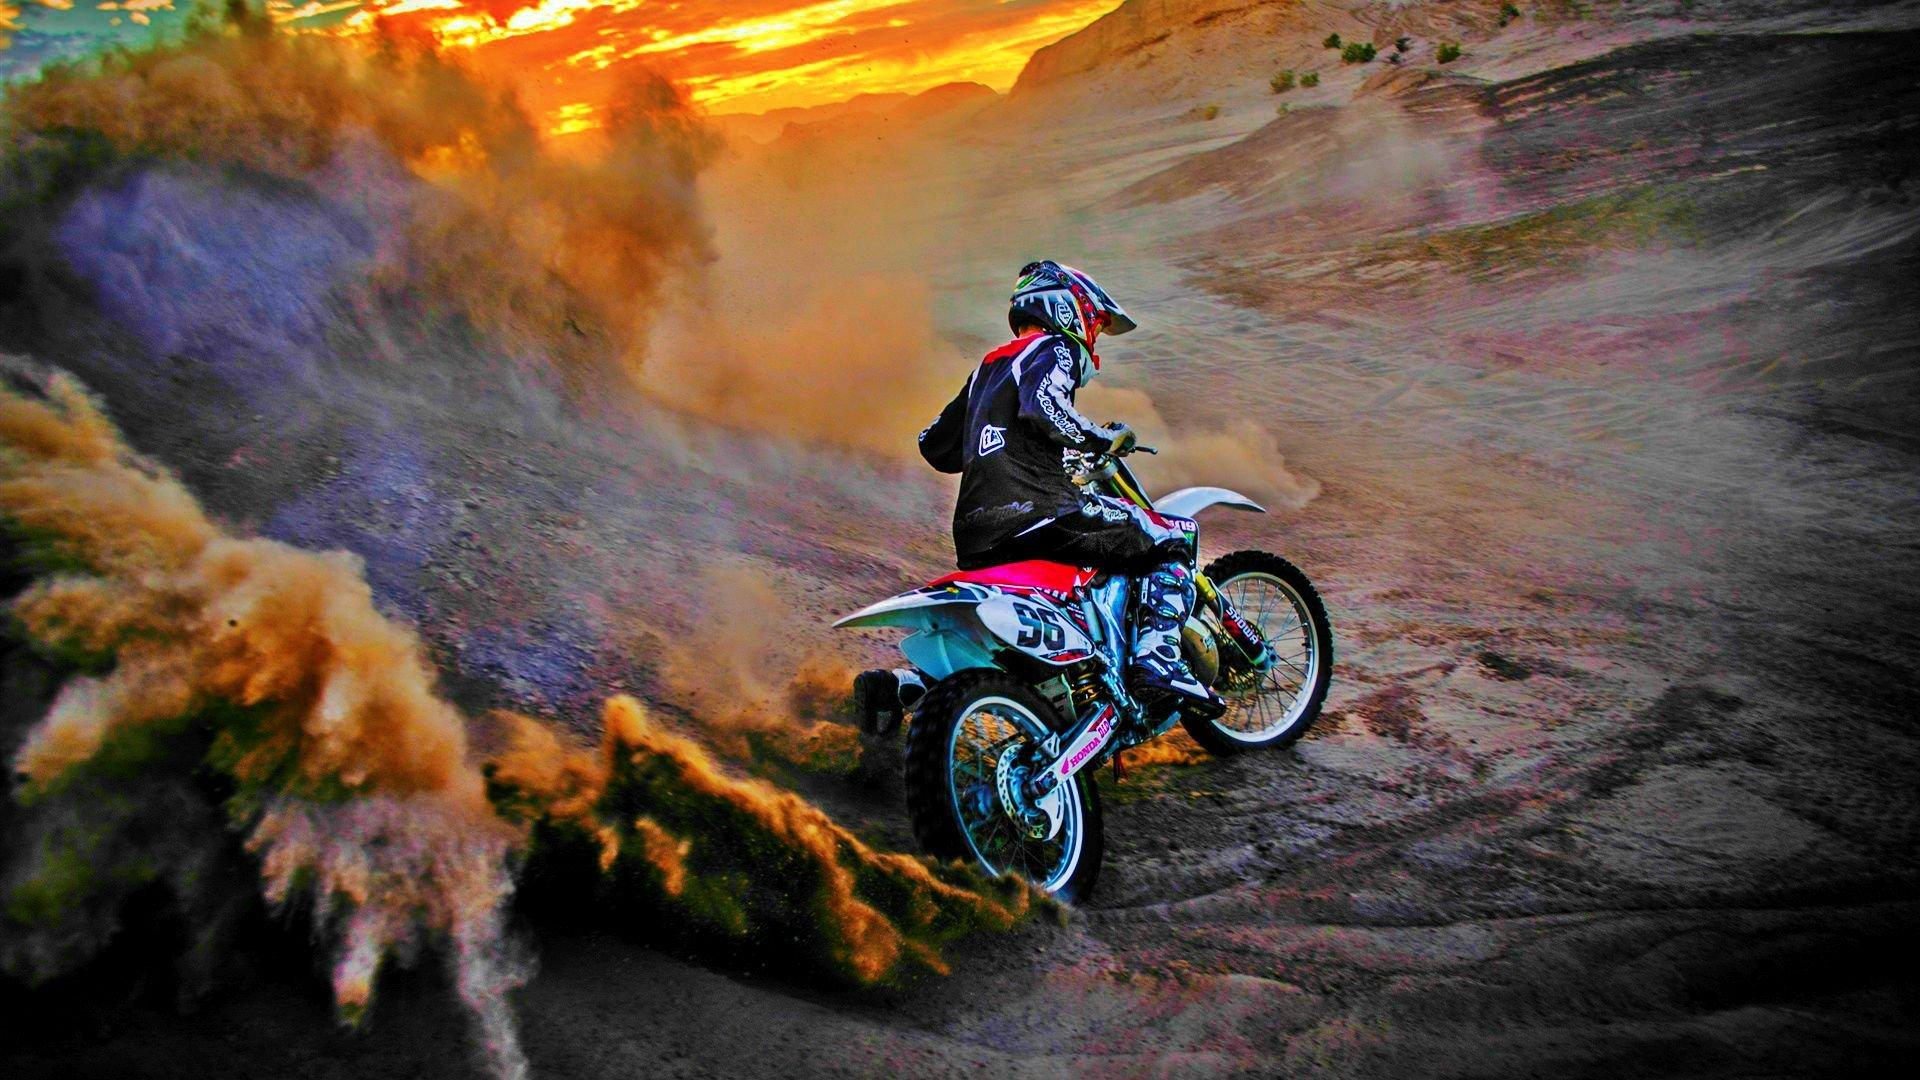 dirtbike motocross moto bike extreme motorbike dirt wallpaper 1920x1080